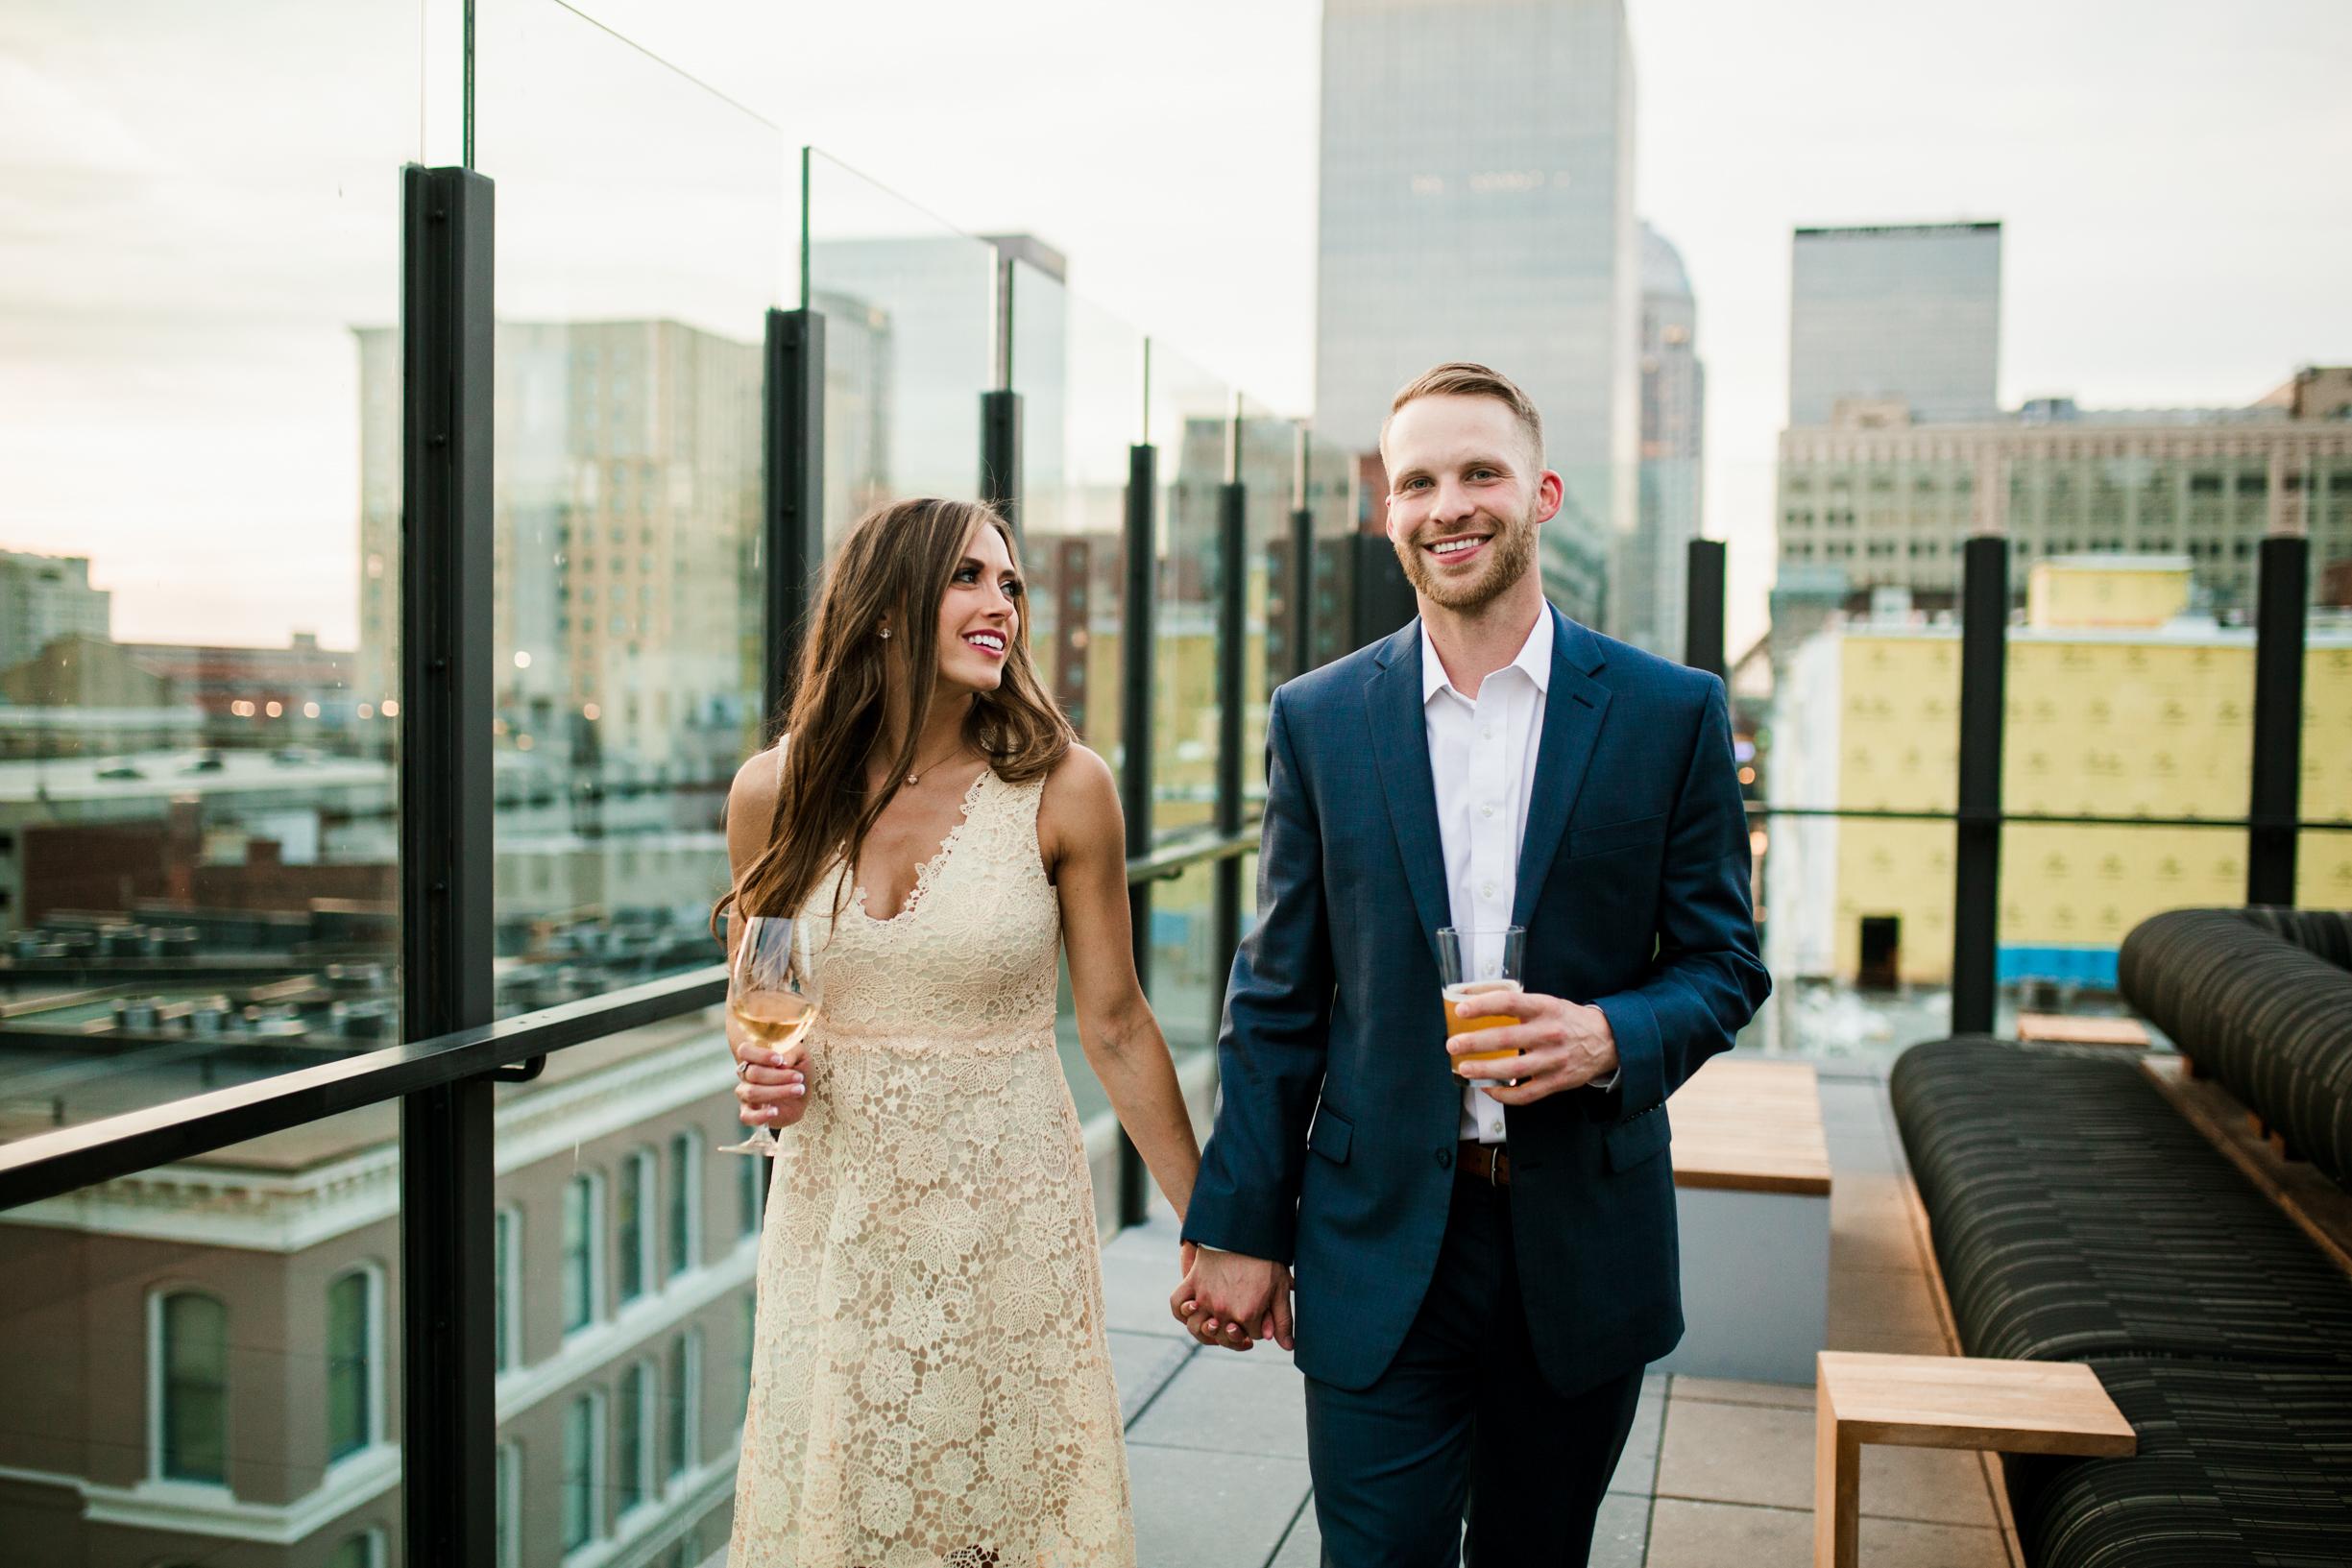 Victoria & Chad Engagement 2018 Crystal Ludwick Photo Louisville Kentucky Wedding Photographer WEBSITE (24 of 48).jpg